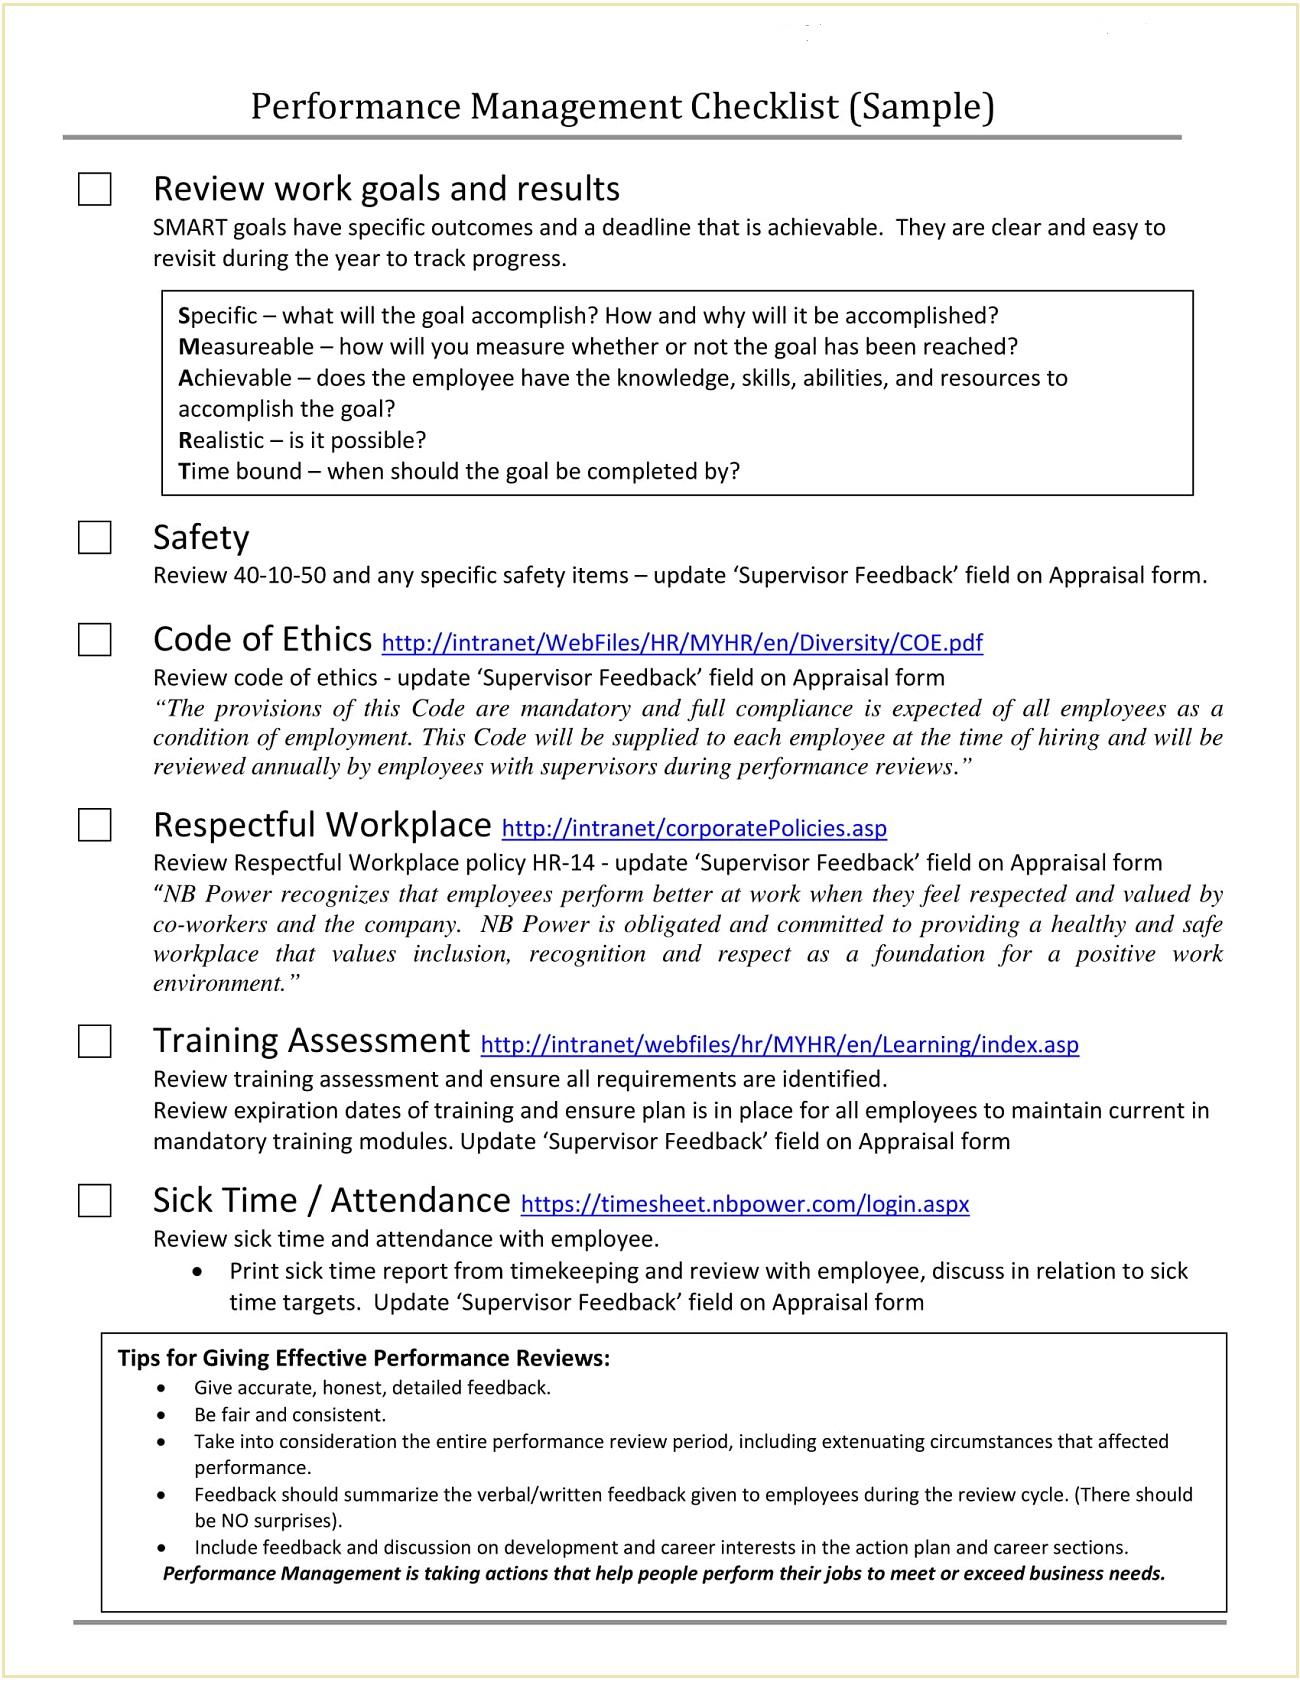 Performance Management Checklist Sample PDF